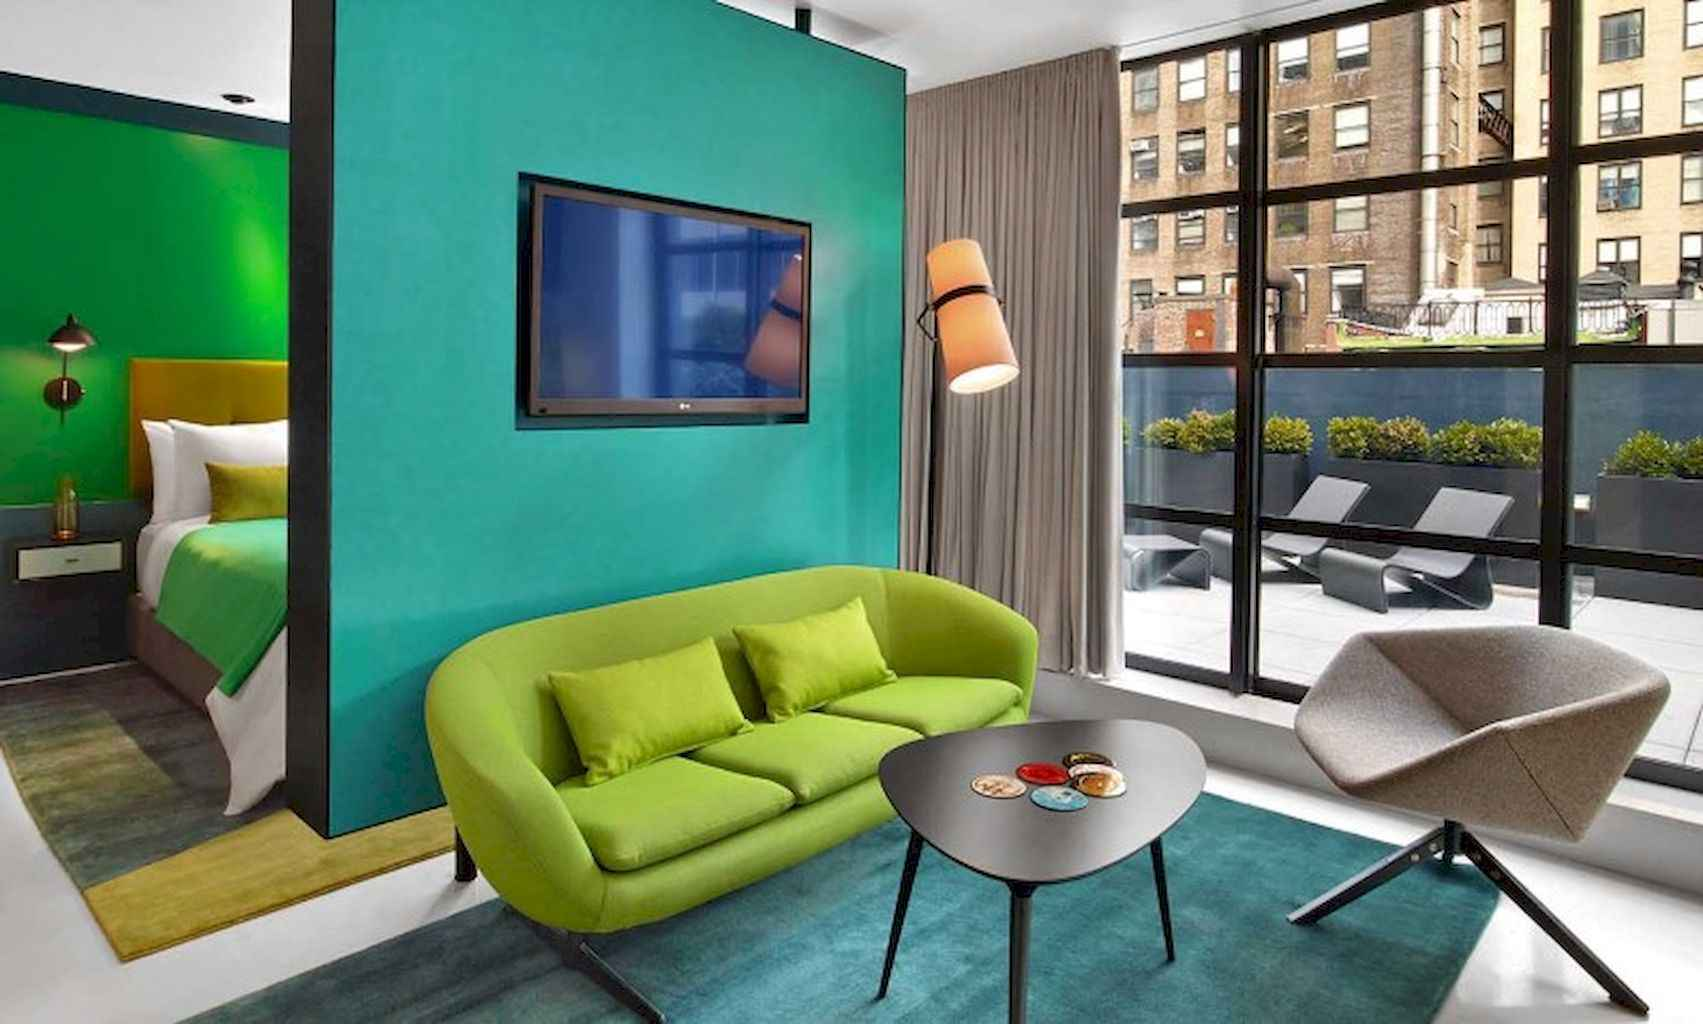 80 Elegant Harmony Interior Design Ideas For First Couple (74)